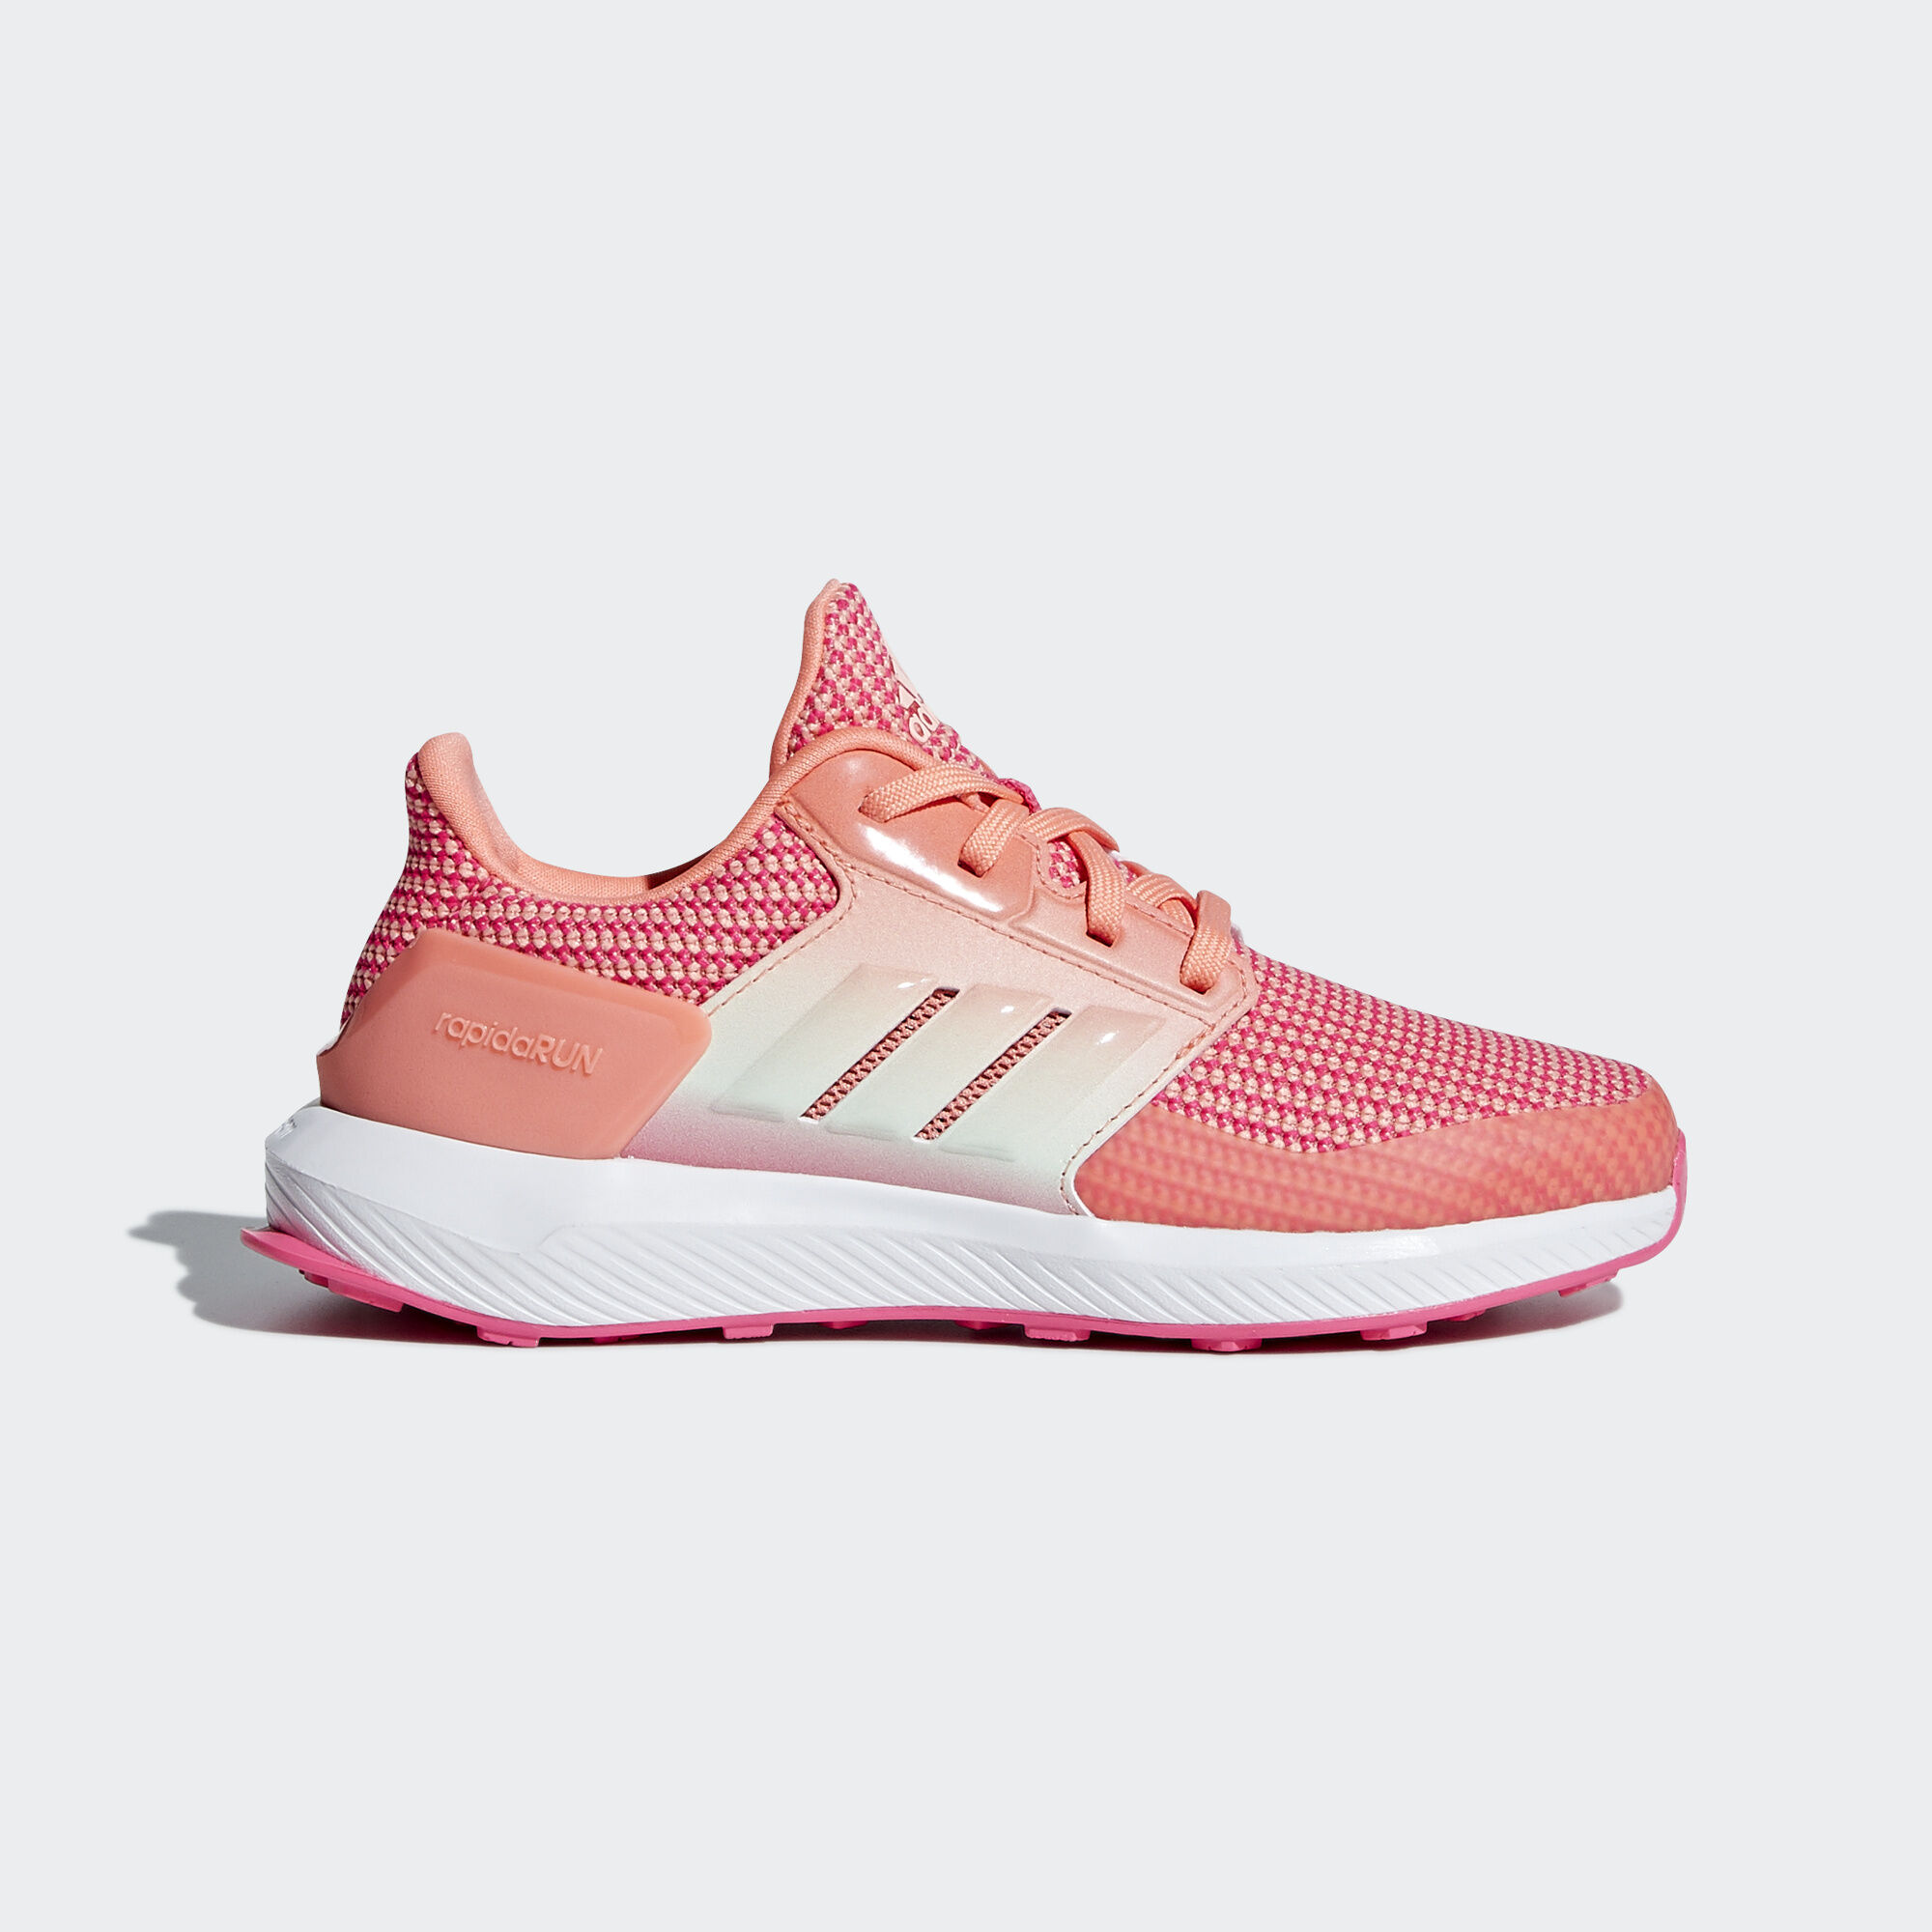 adidas - RapidaRun Shoes Real Pink   Chalk Coral   Aero Green AH2391 c2dc92c2b5d